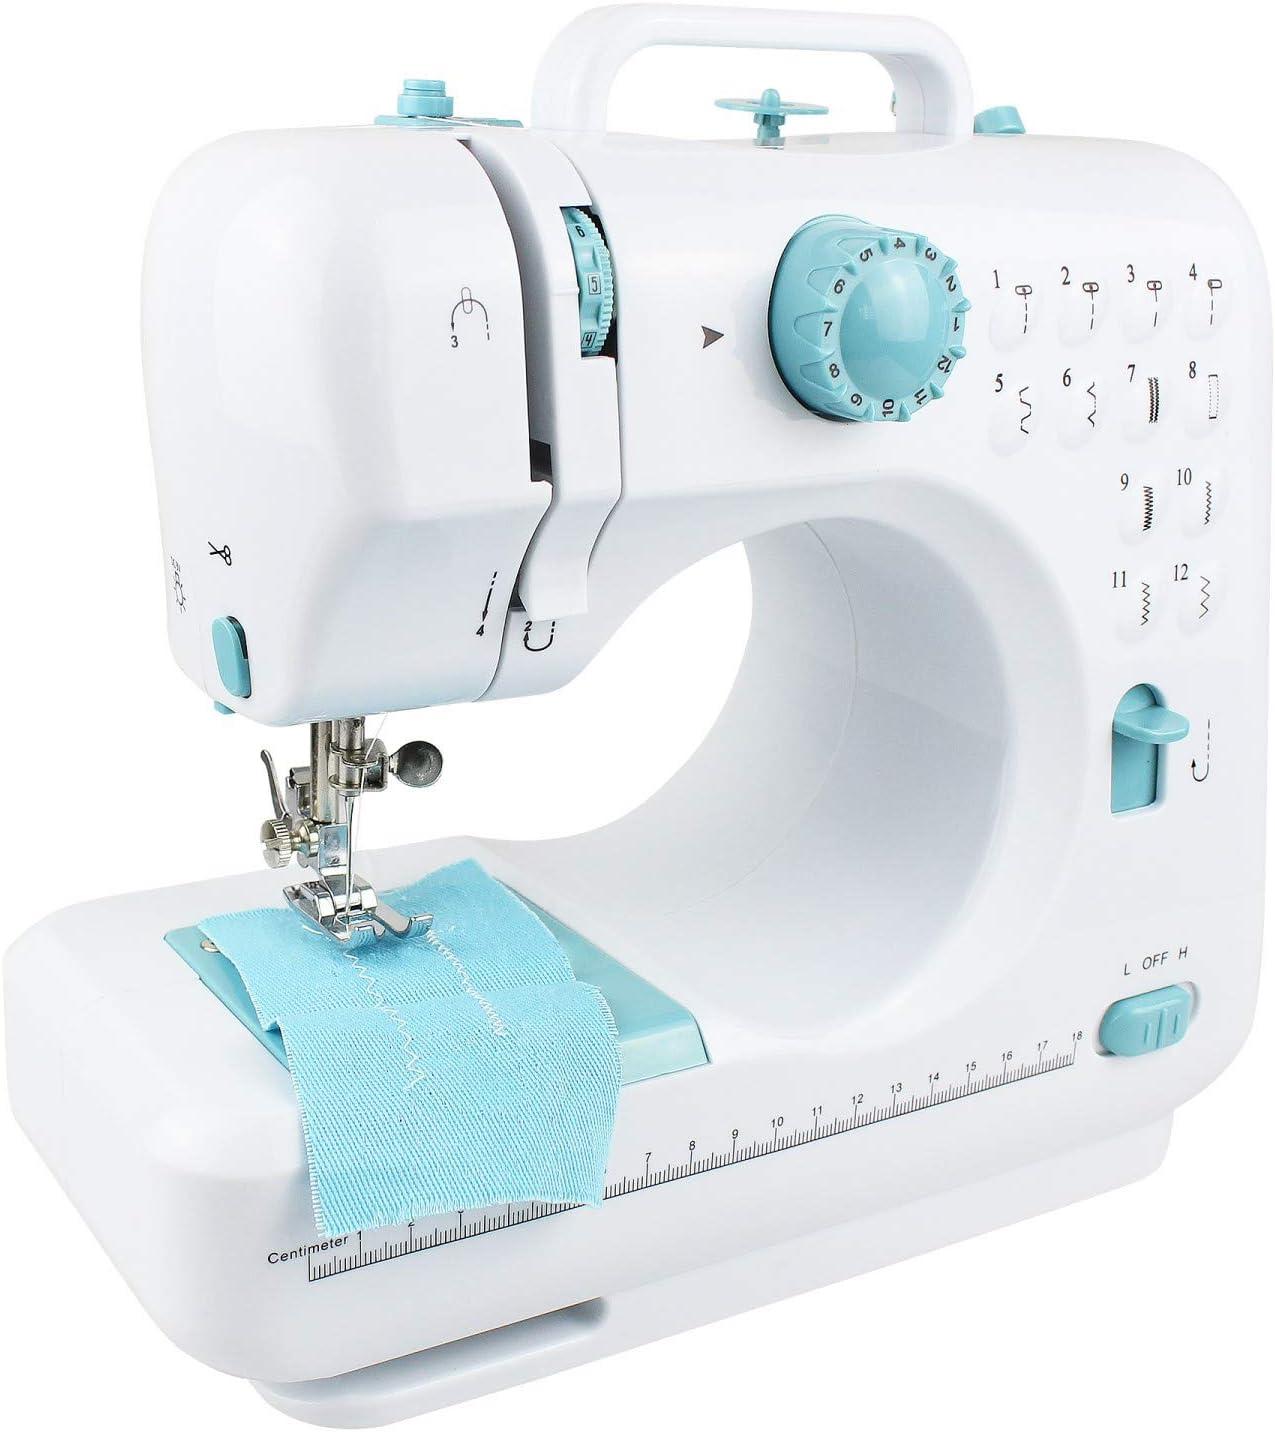 Leogreen - Máquina de Coser 12 Puntadas, Máquina de Coser Portátil, Blanzo/Azul, 12 Patterns, Material: Plástico ABS, Peso: 2,5 kg: Amazon.es: Hogar